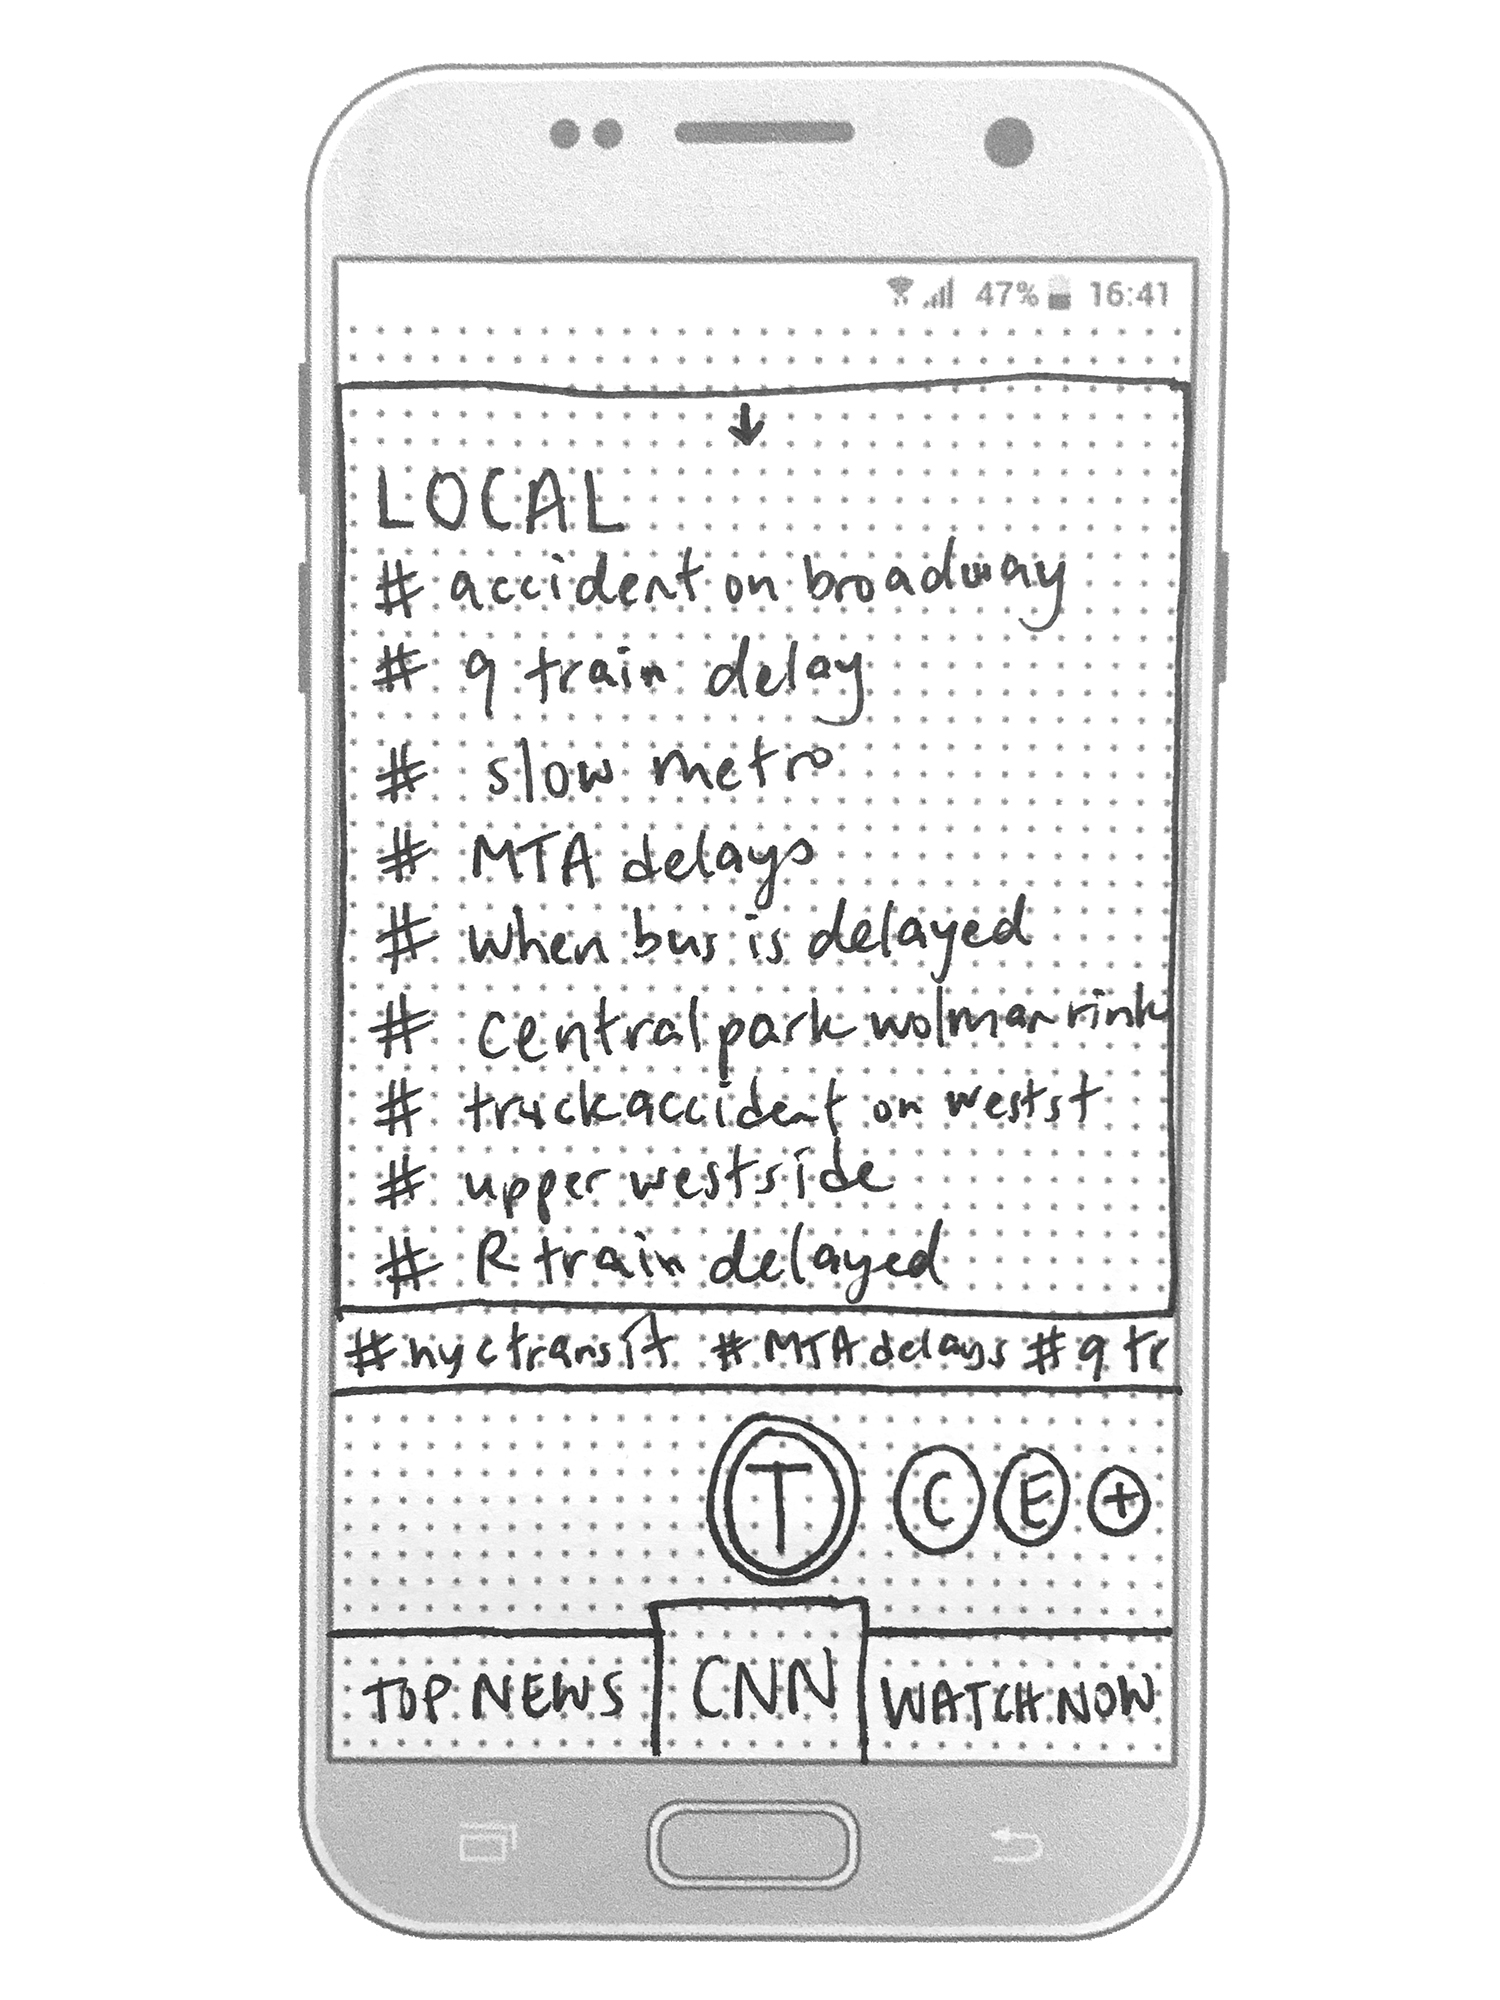 Local Trending News